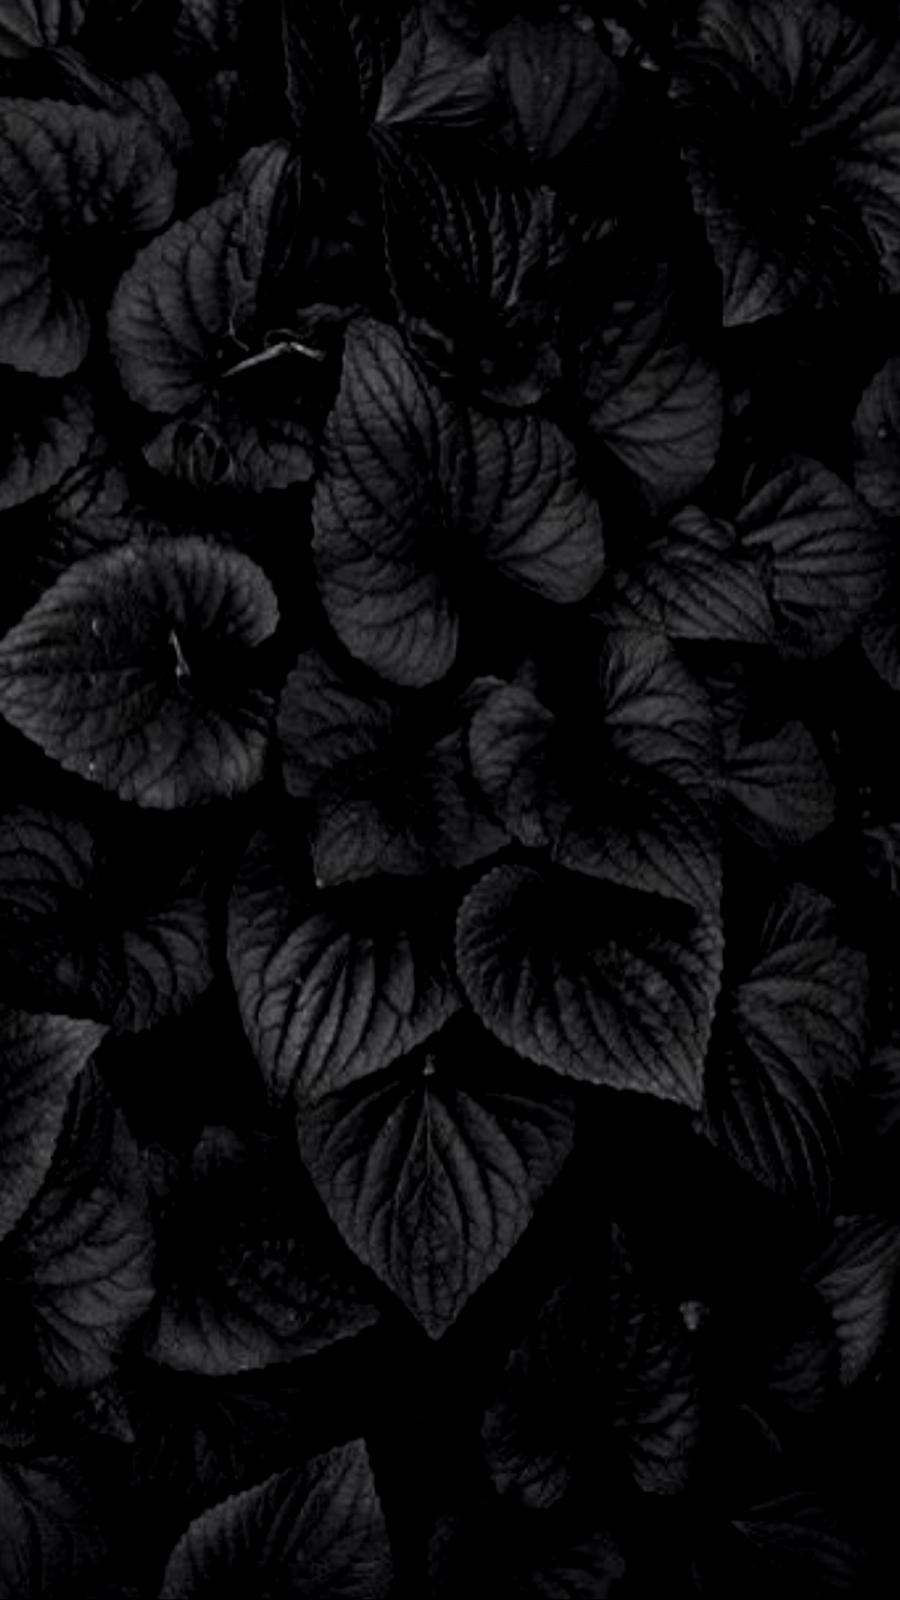 Aesthetic Black Flower Wallpapers - Wallpaper Cave